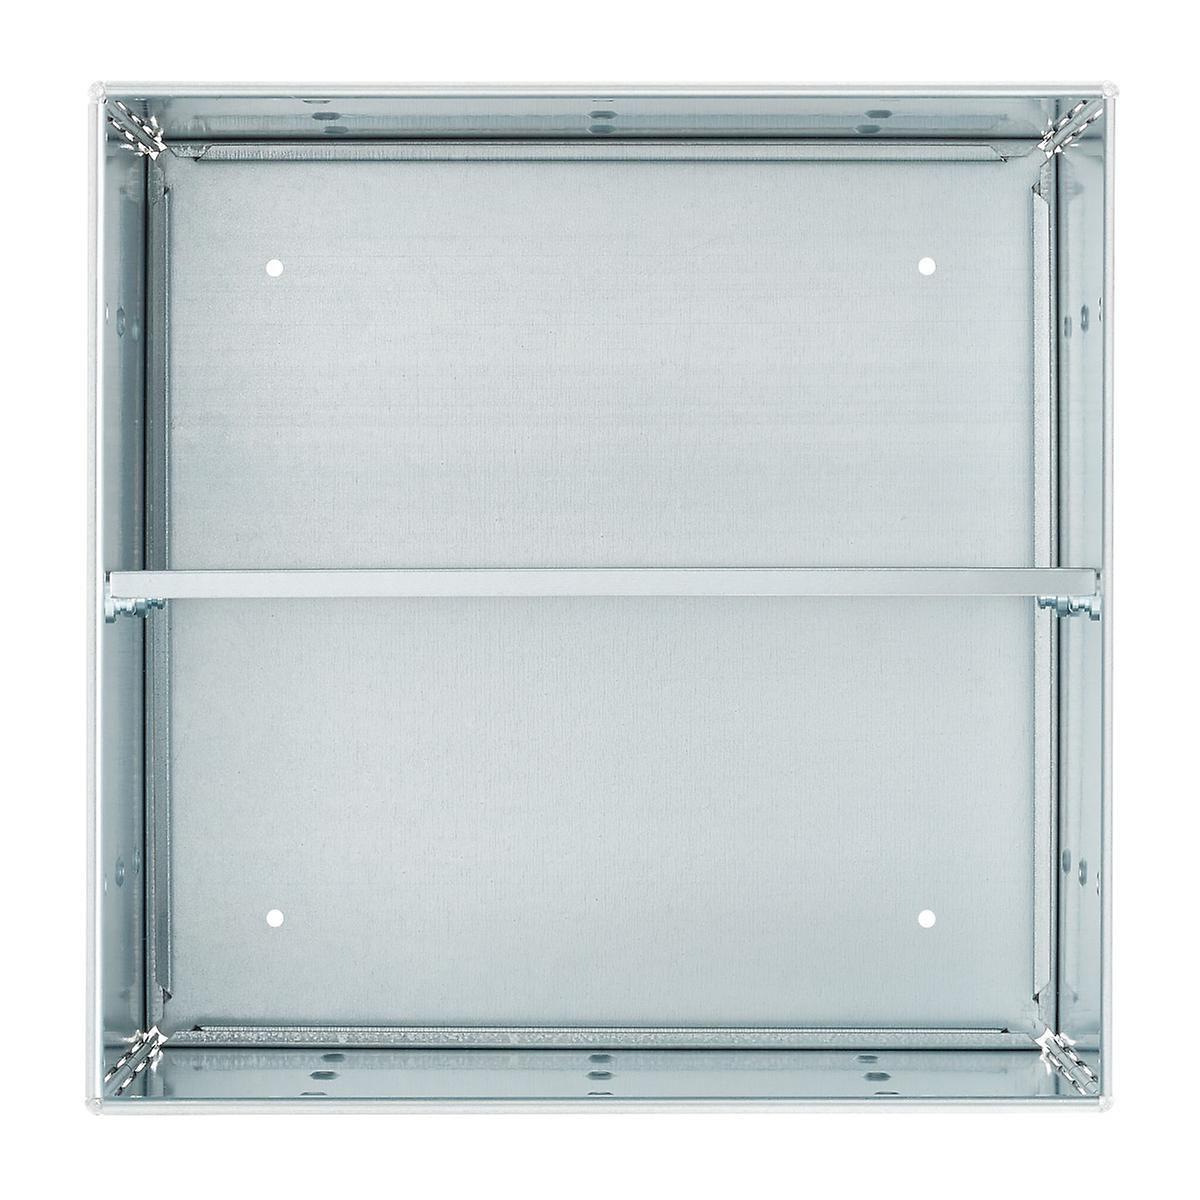 Galvanized QBO Steel Cube Shelf